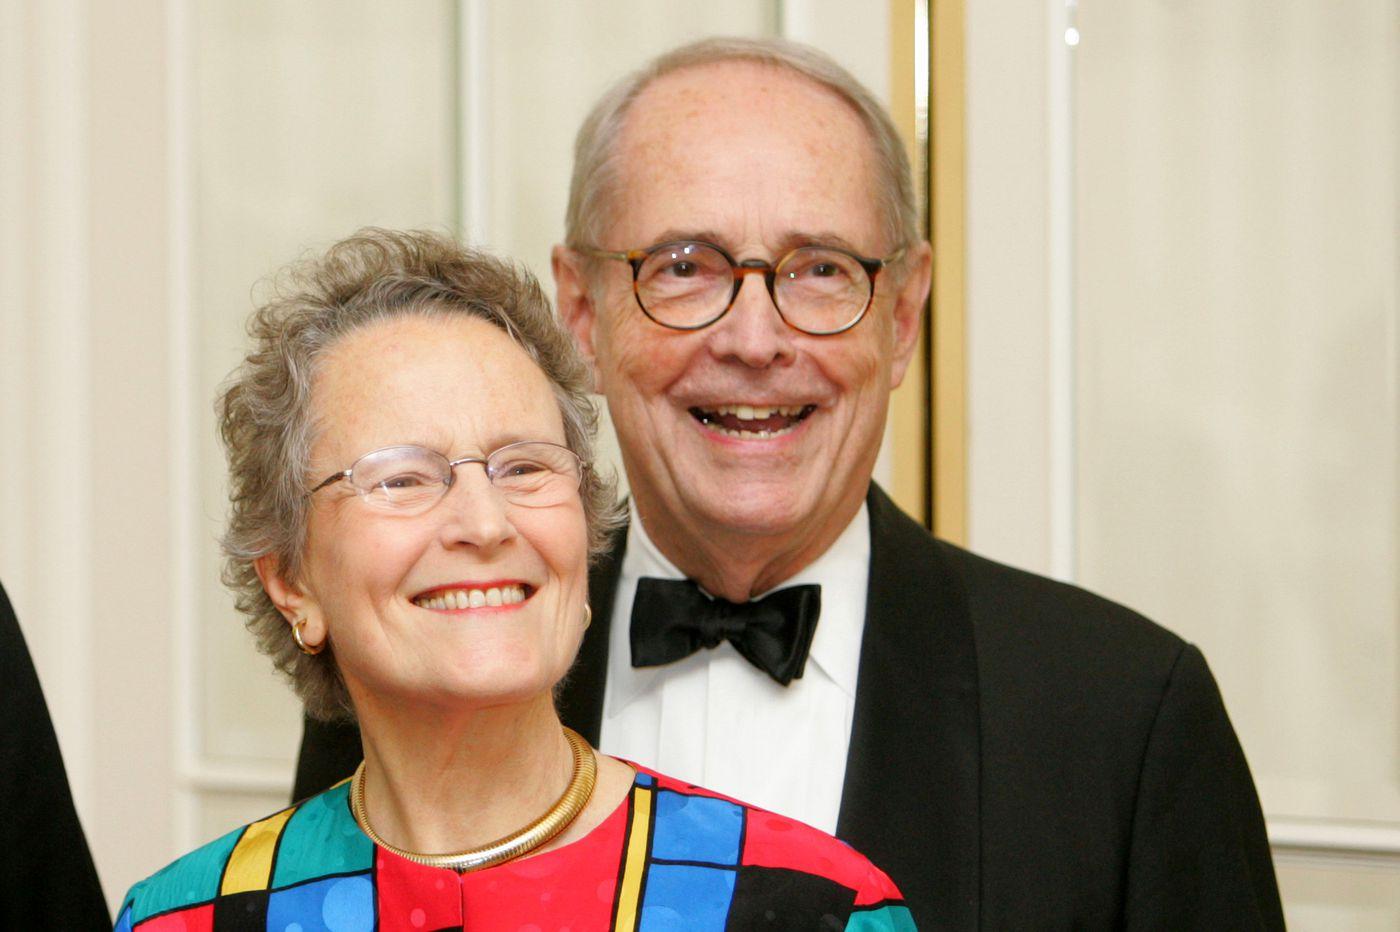 Former Pennsylvania Gov. Dick Thornburgh dies at 88